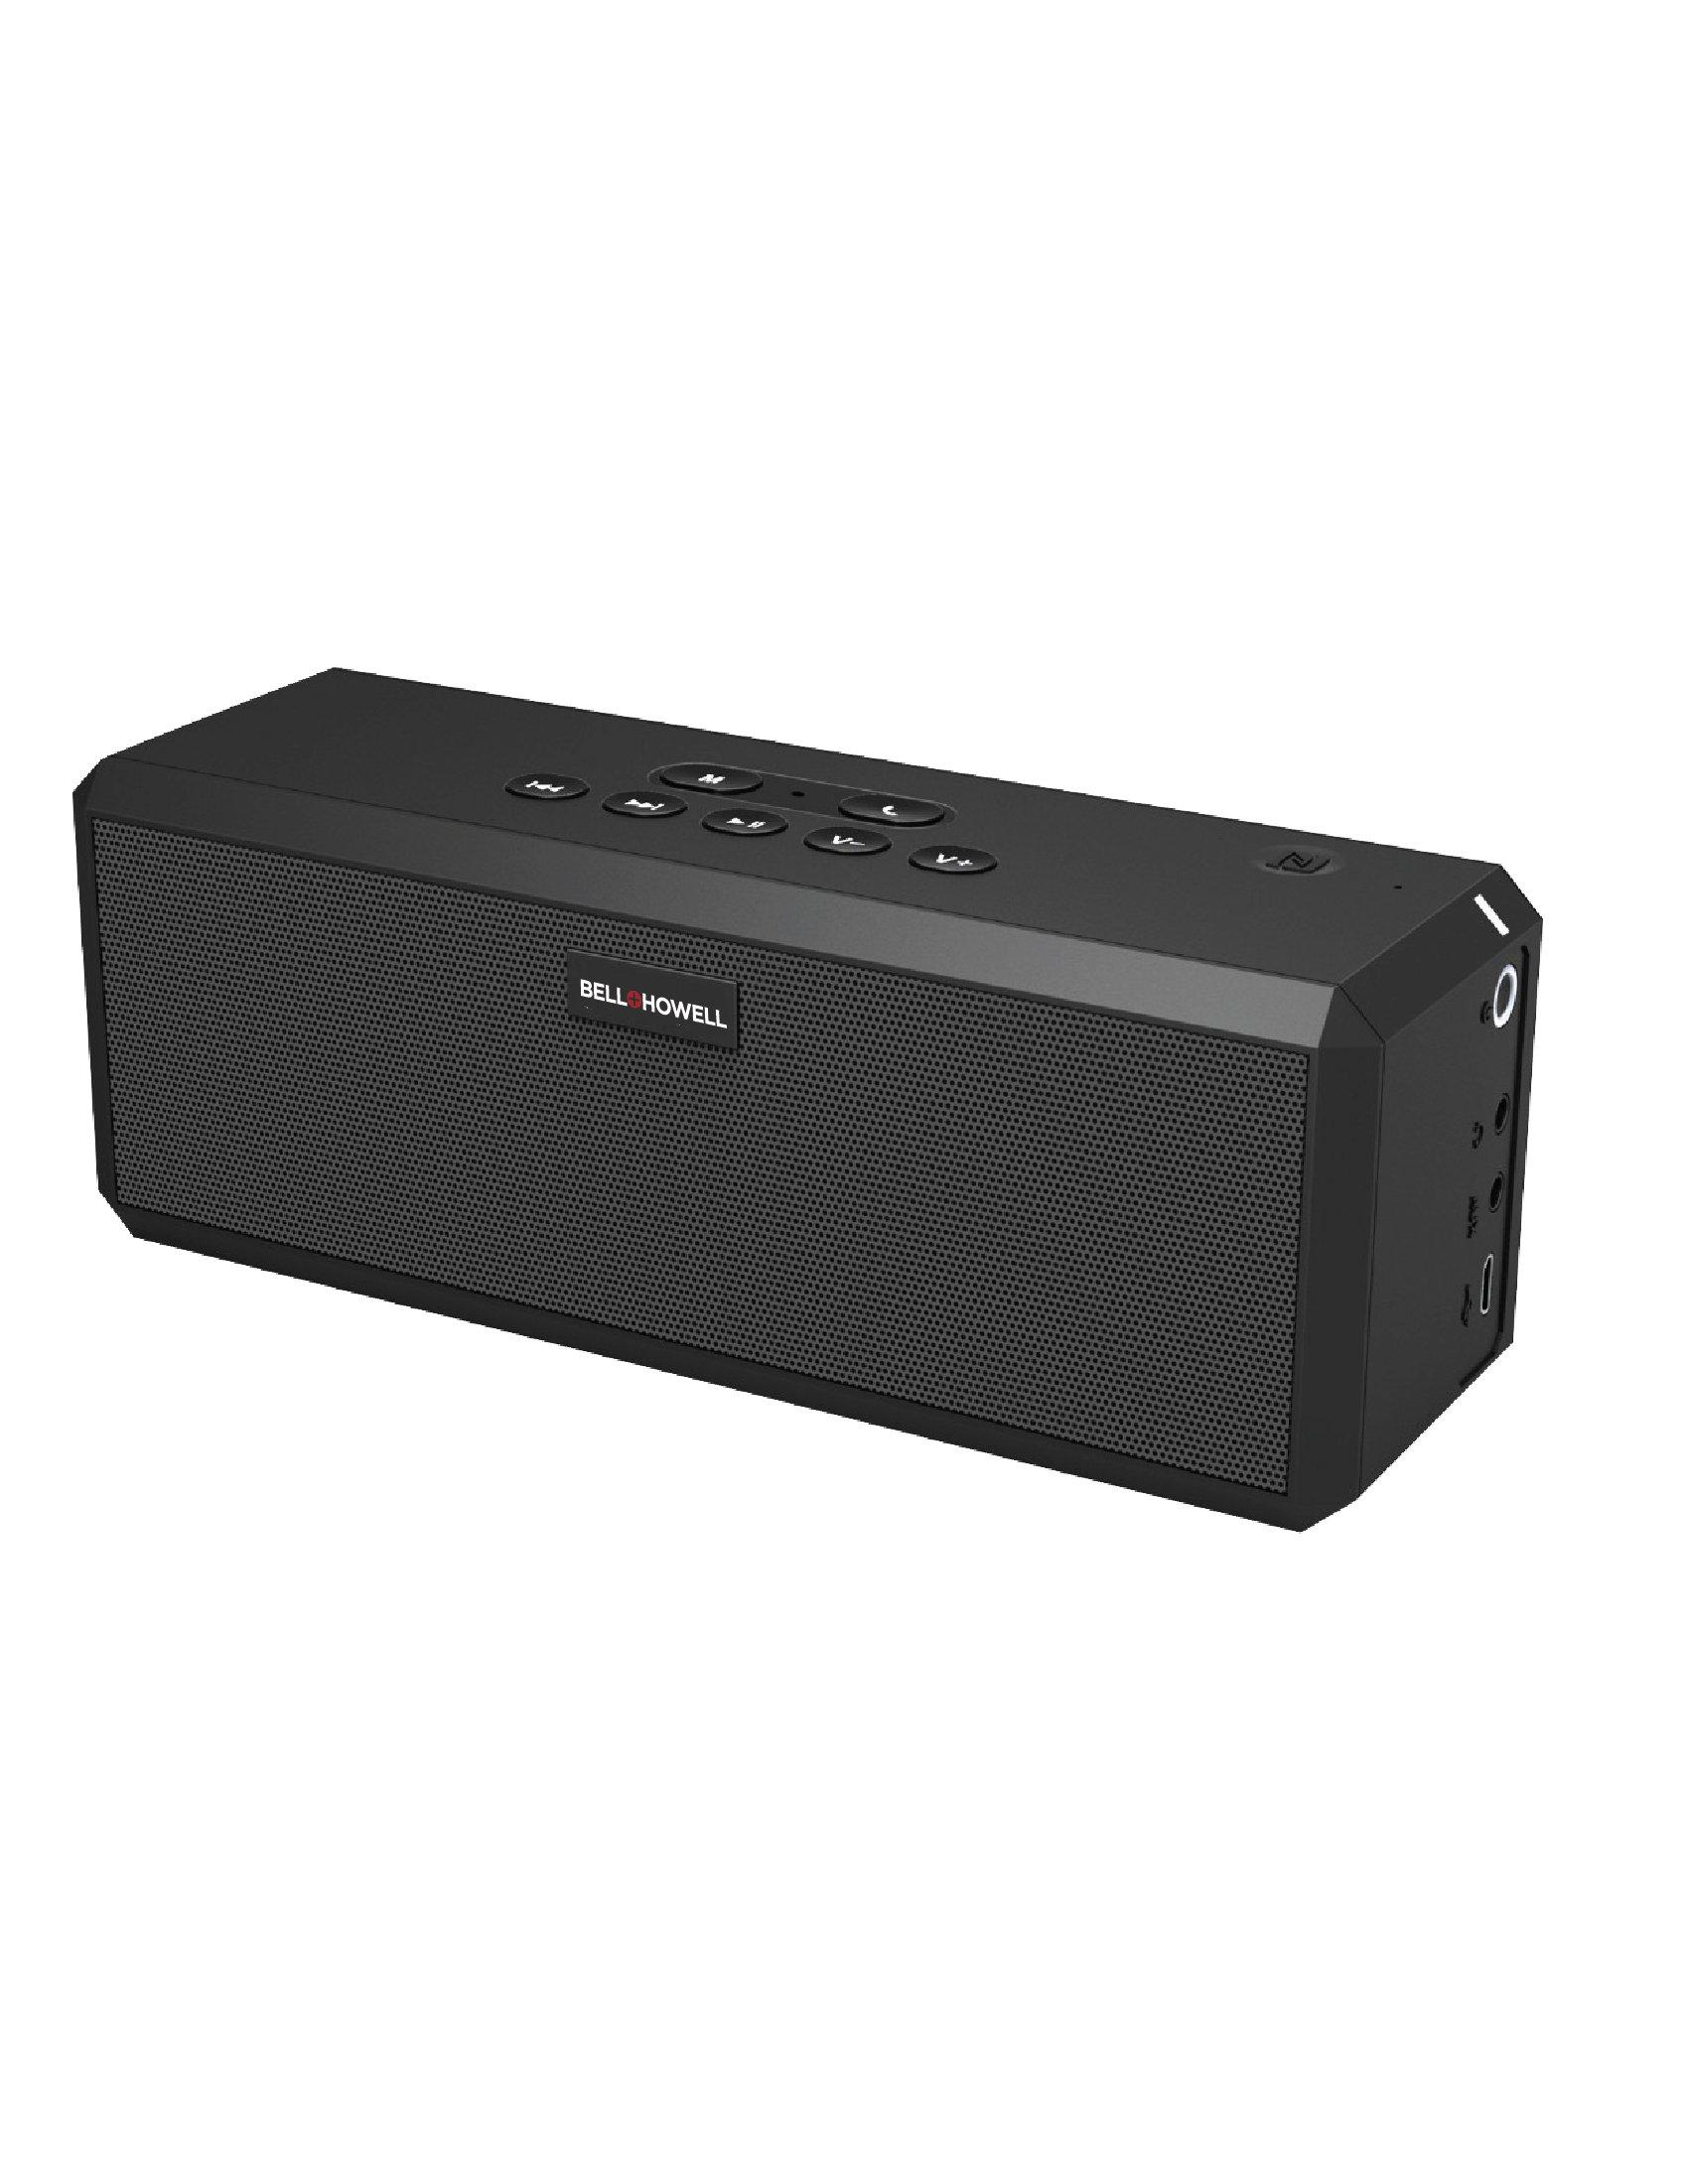 Bell+Howell BH70TWS True Wireless Stereo Link Cinema Speaker